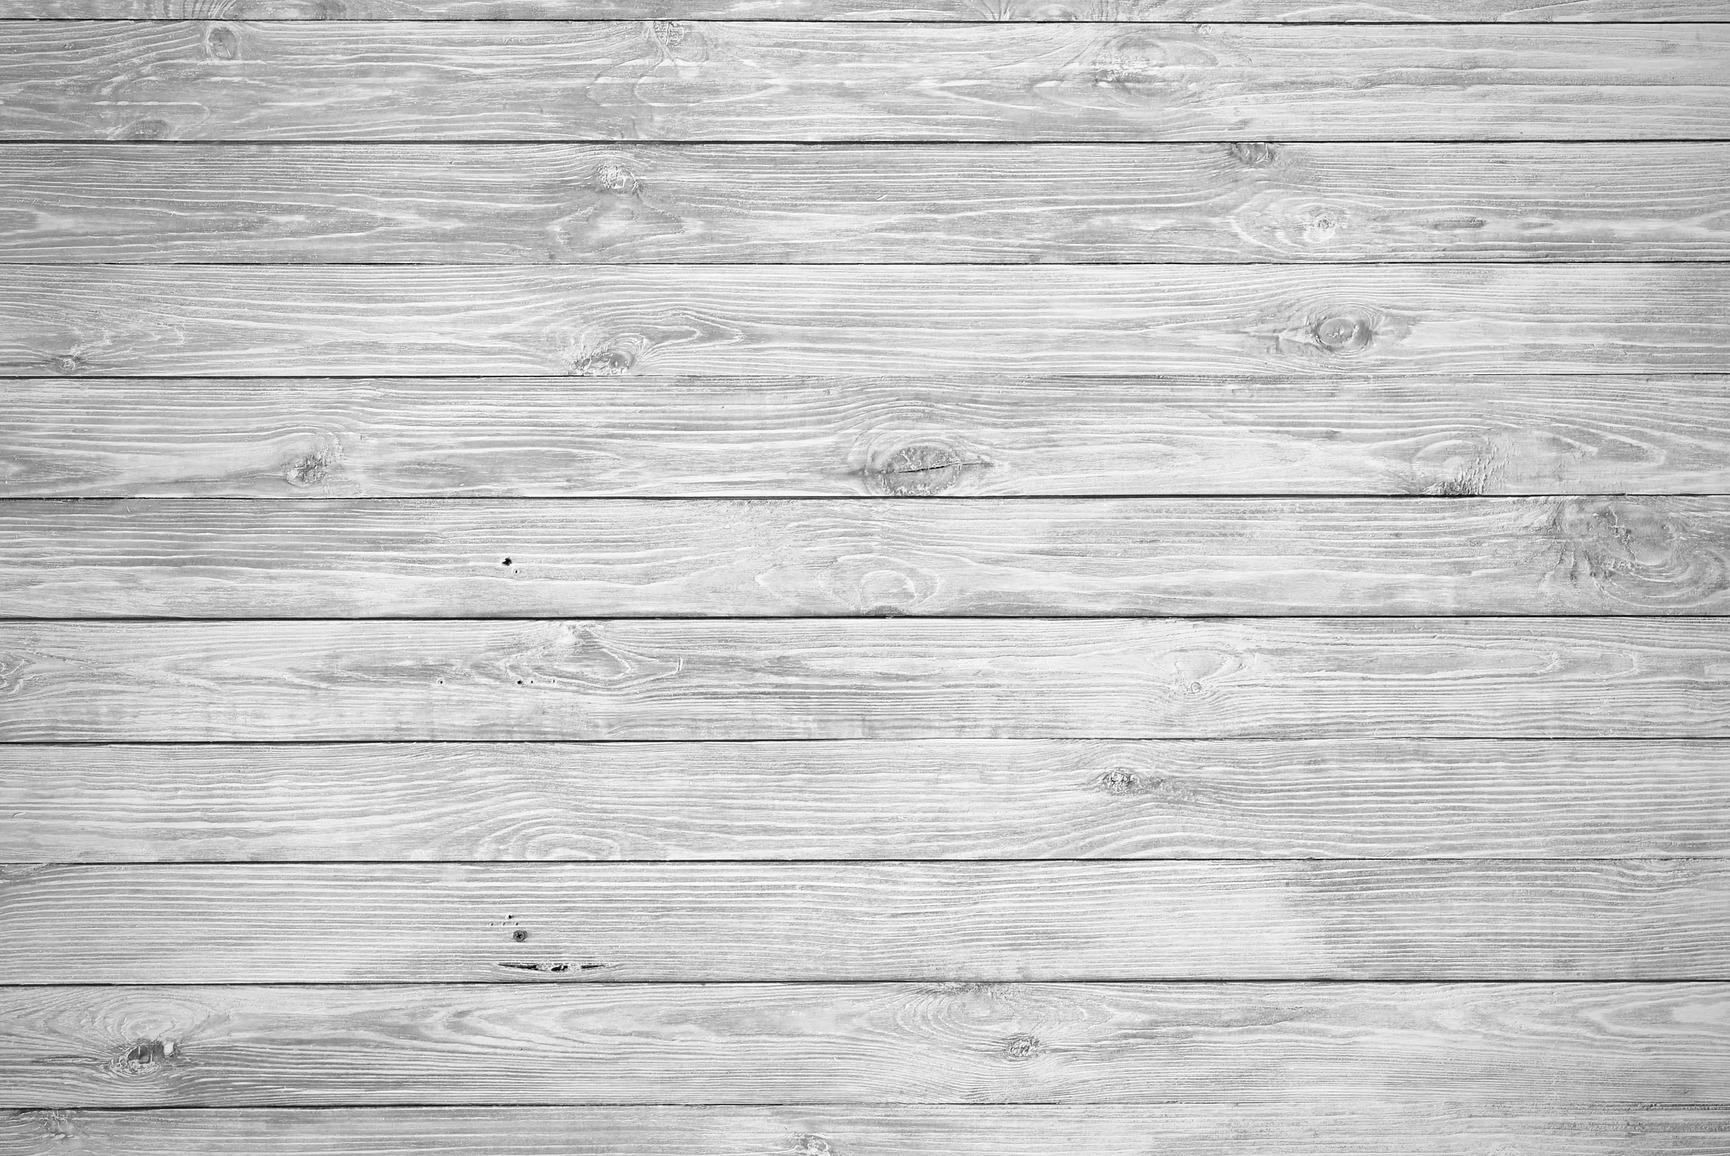 White Wood Background Related Keywords & Suggestions - White Wood Background Long Tail Keywords